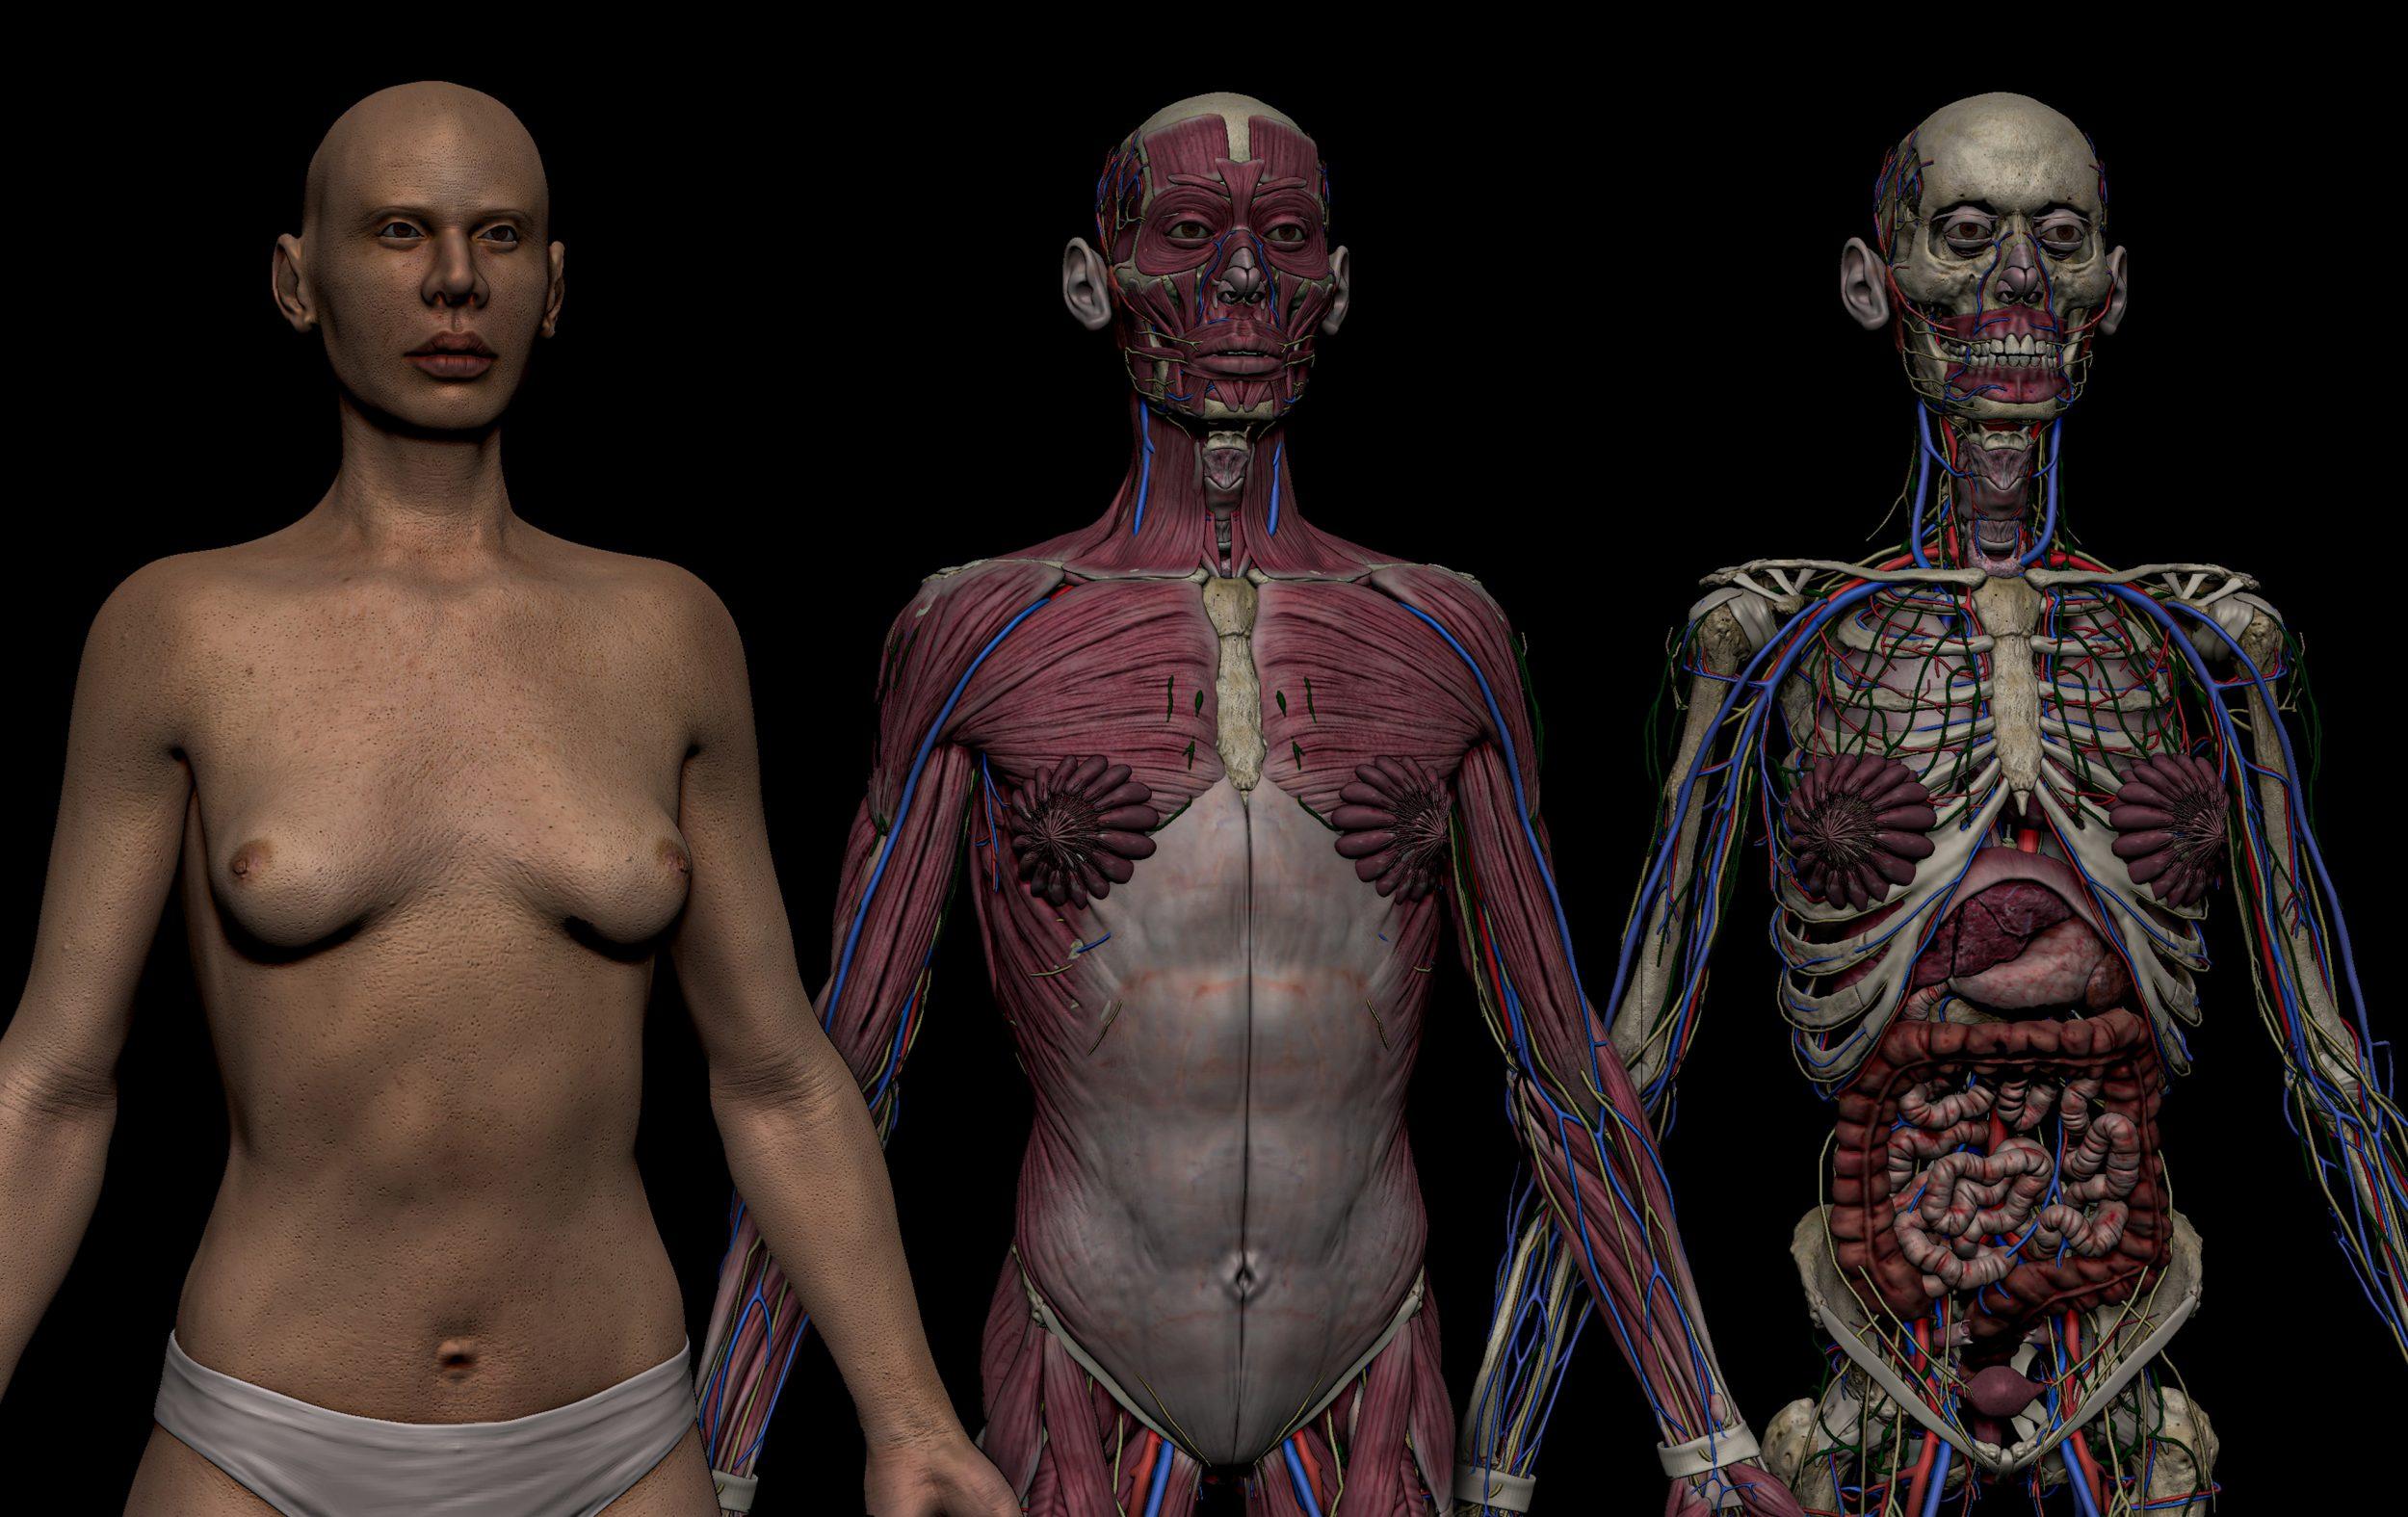 HD Female Complete Human 3D Anatomy Model